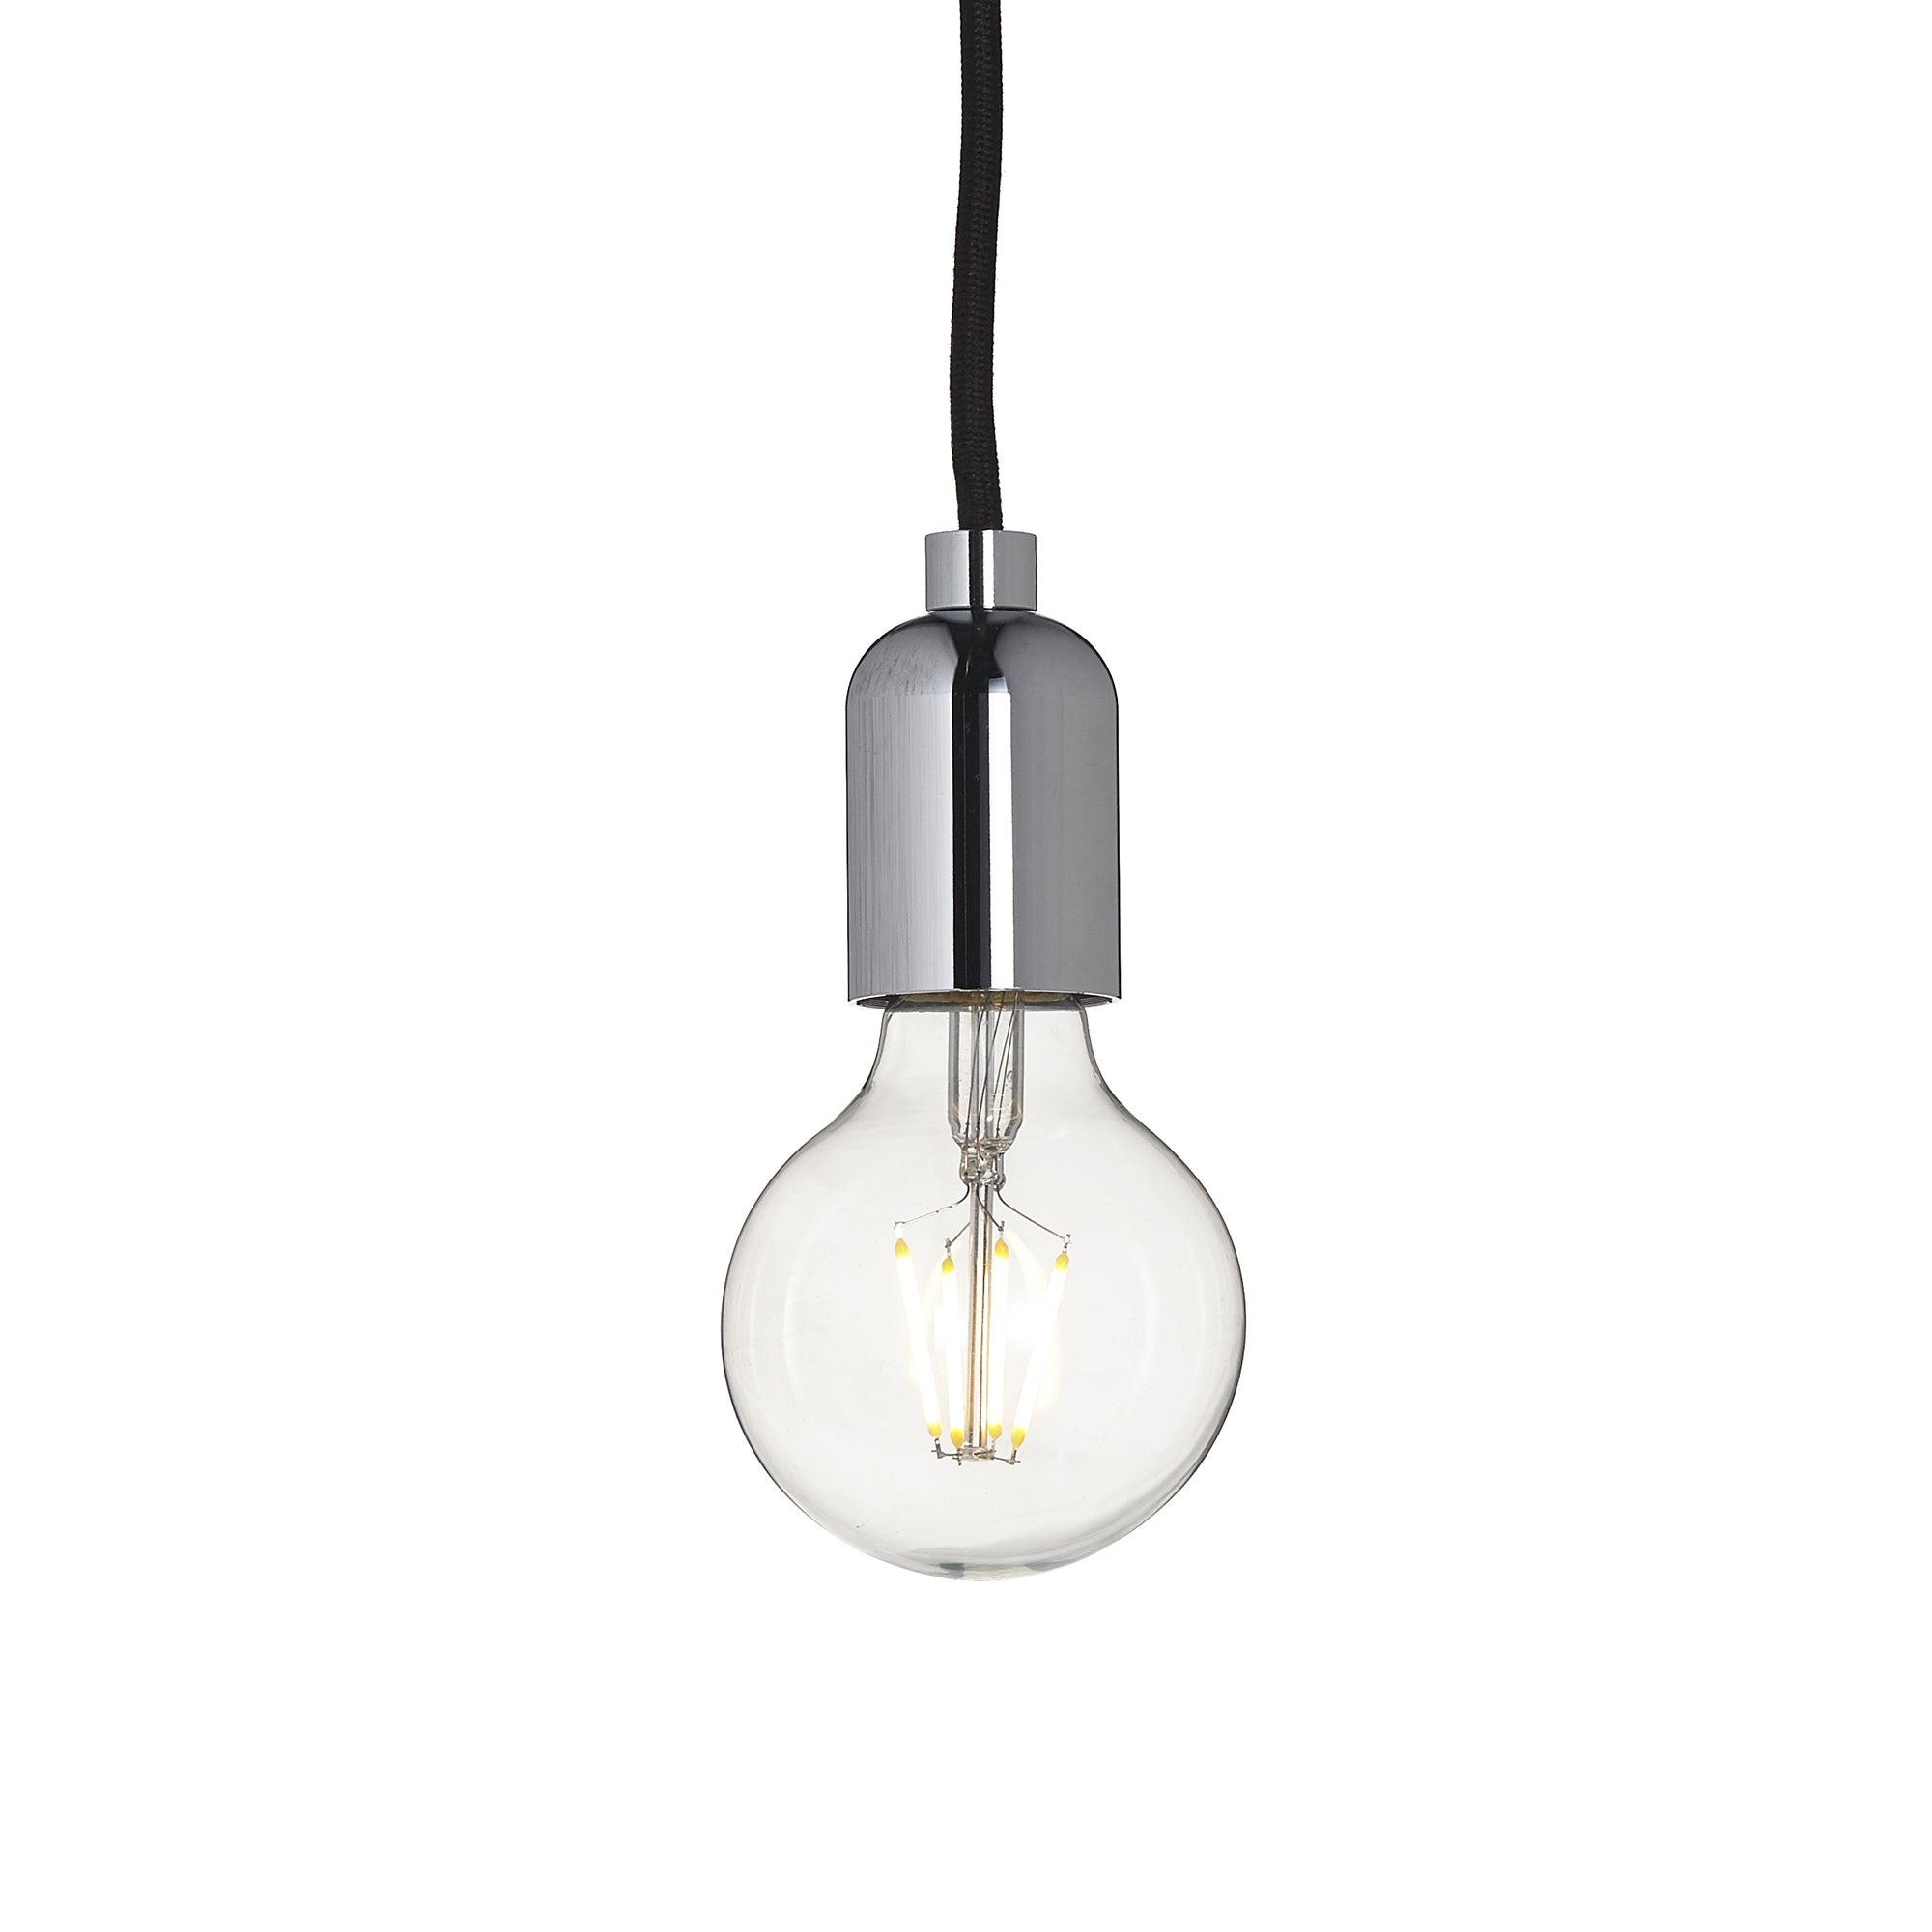 Photo of Vintage globe drop light bulb chrome